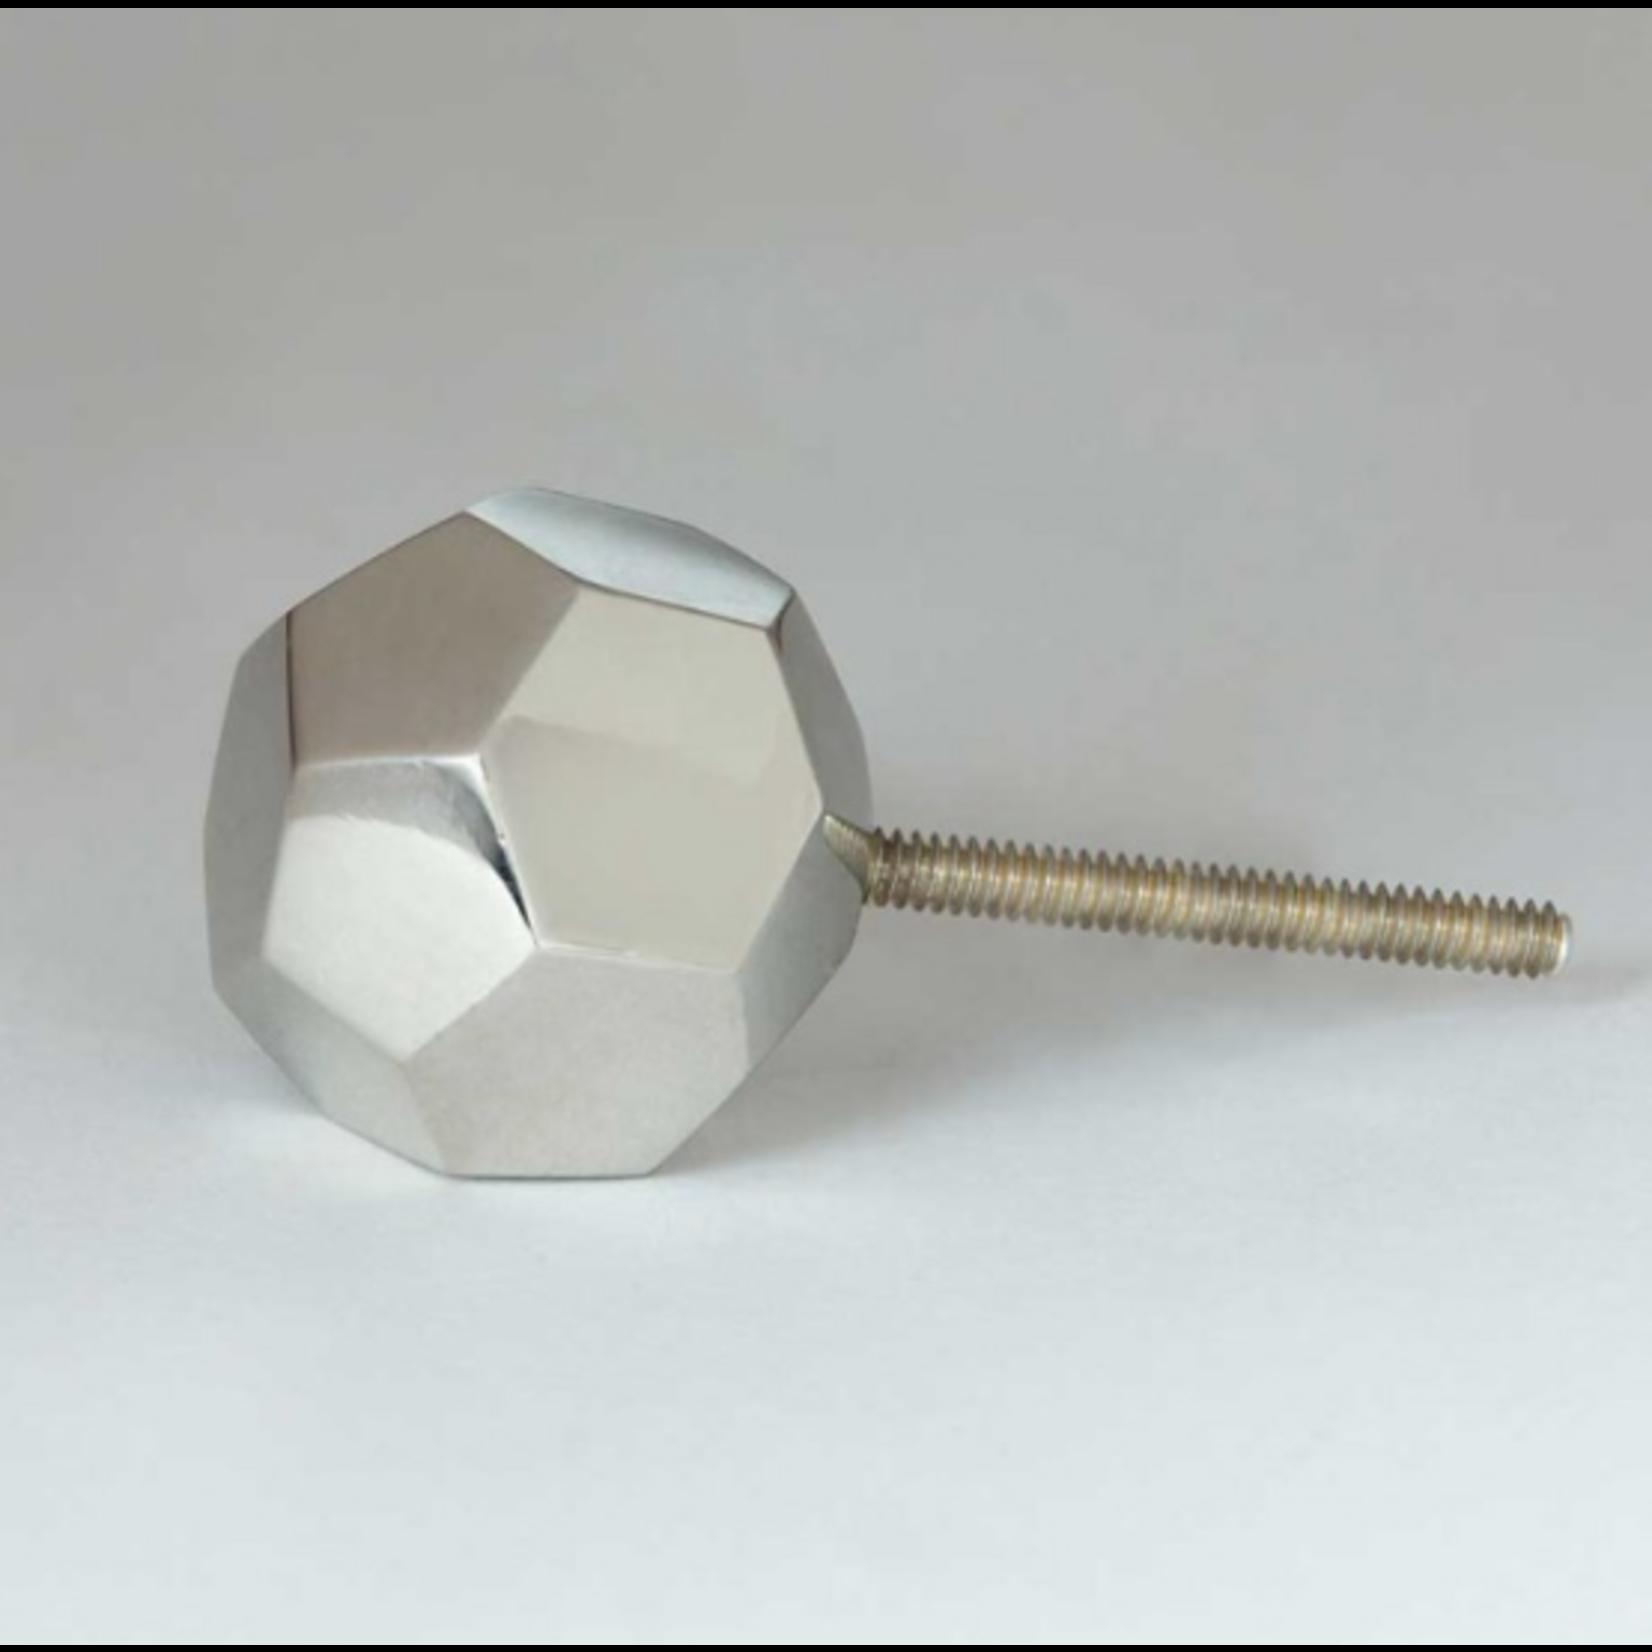 BoDuck Faceted Irregular Octagonal Silver Knob